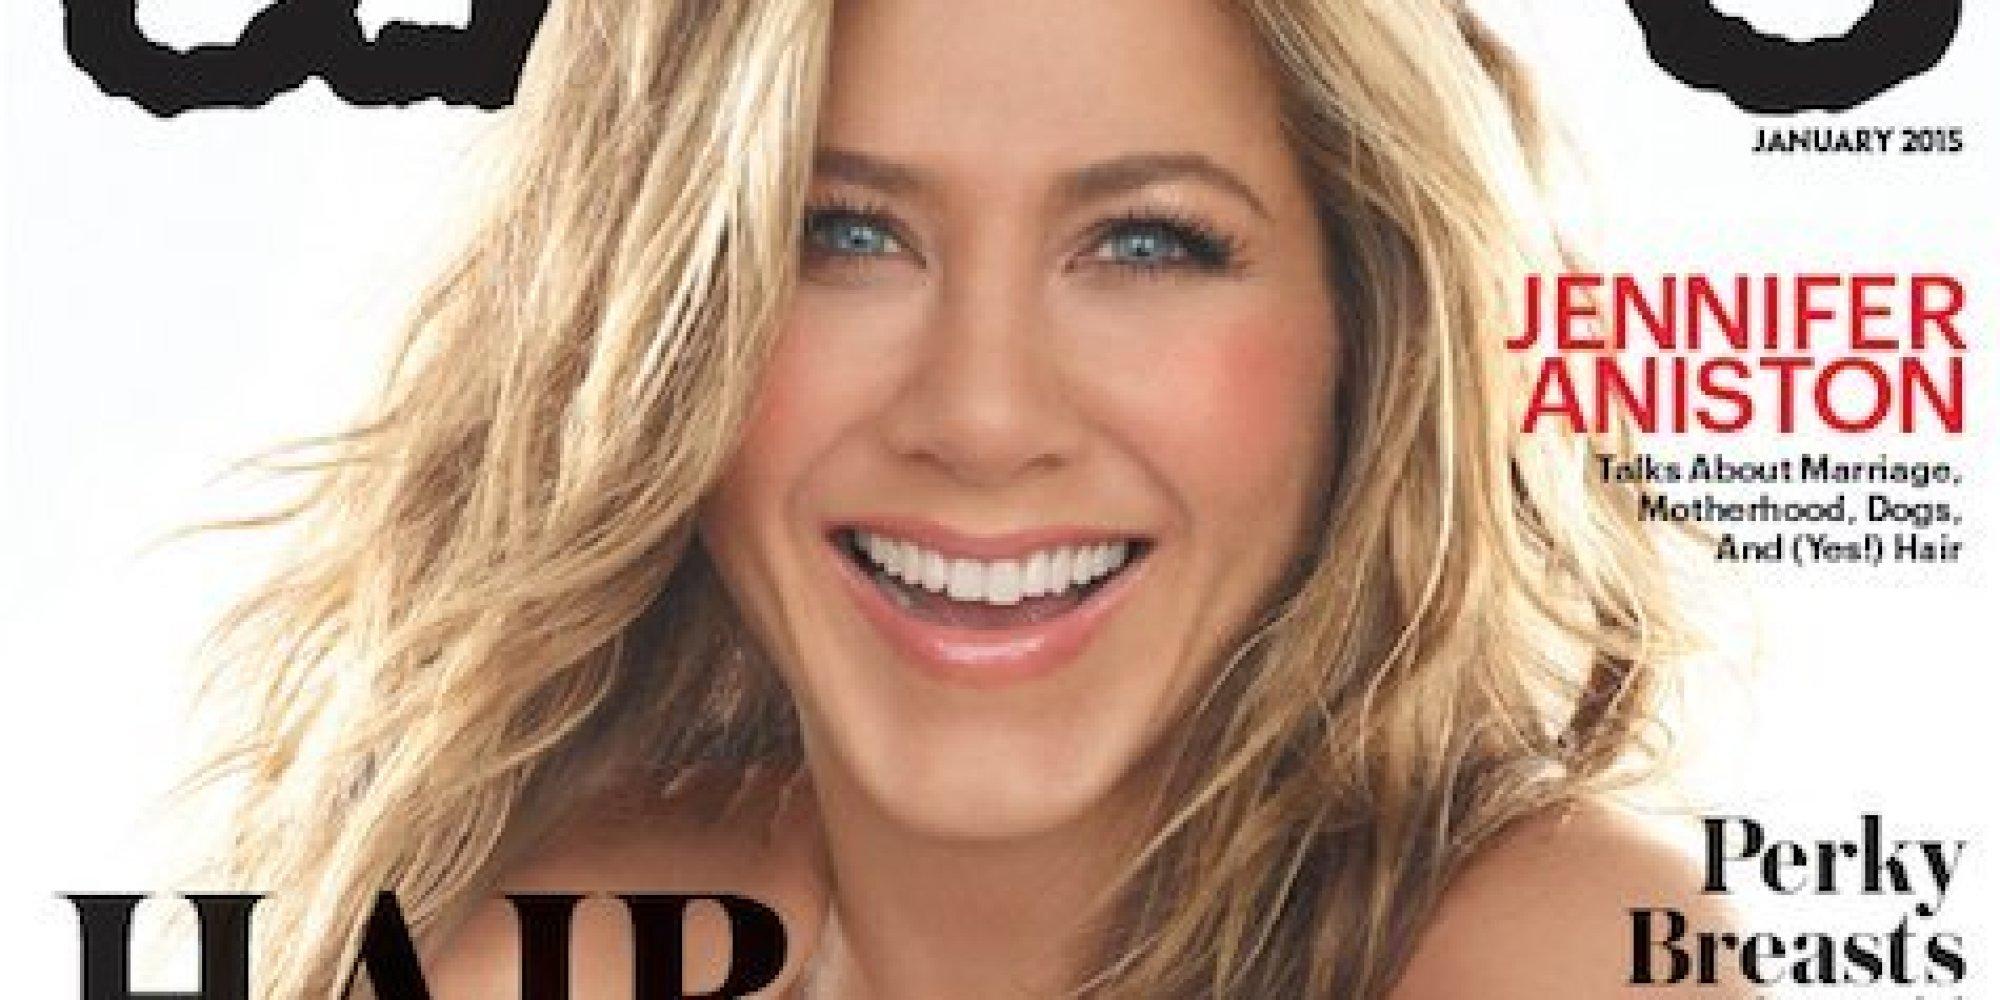 Jennifer Aniston Talks Motherhood And The Unfair Pressure To